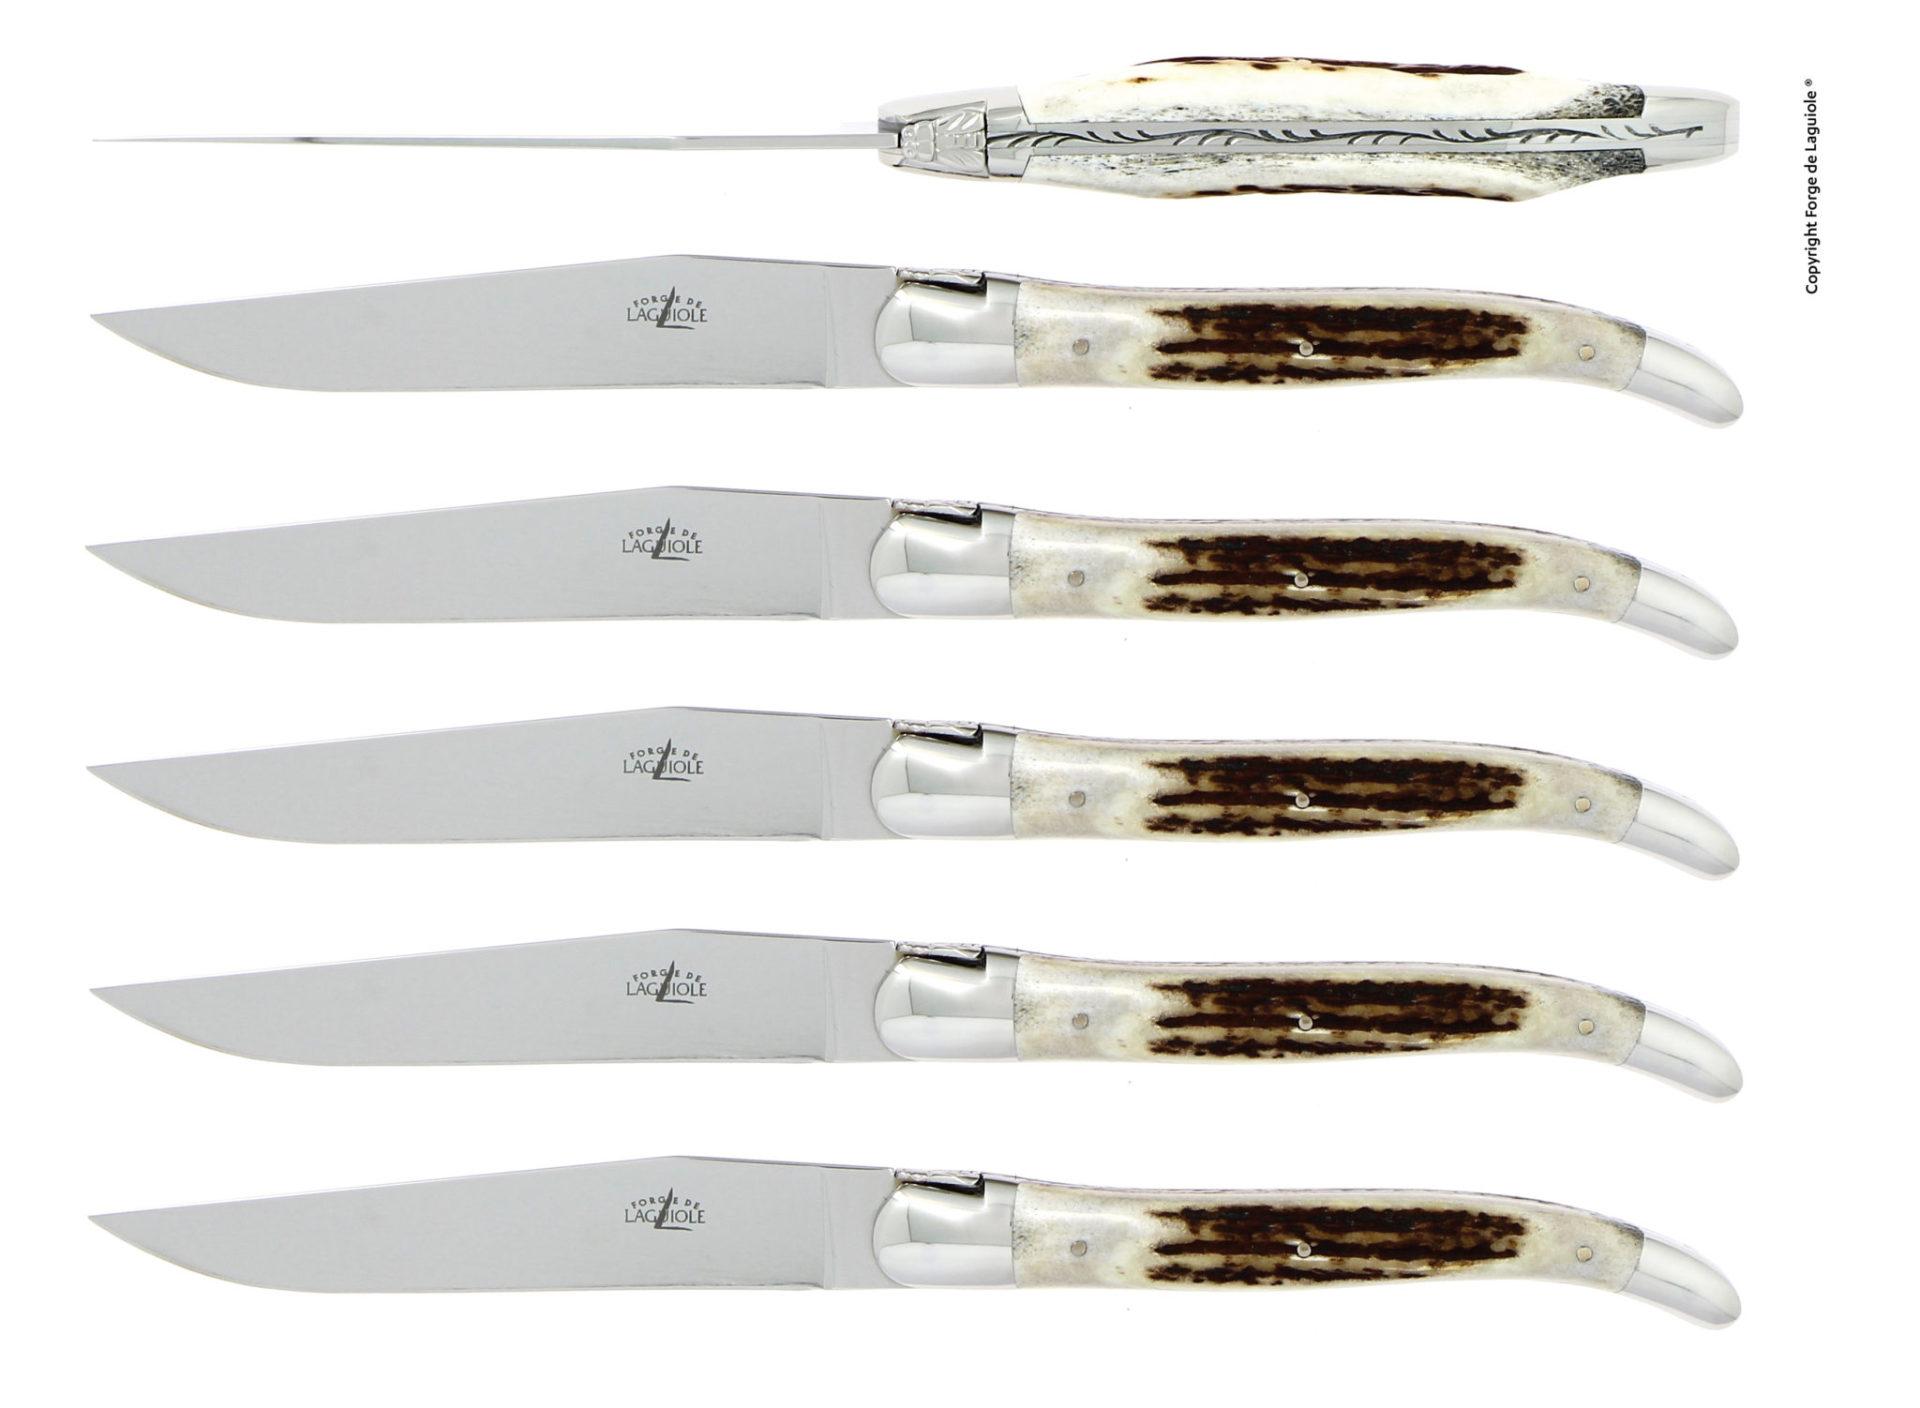 Table knives, high polished finish with Deer antler handle, set of 10